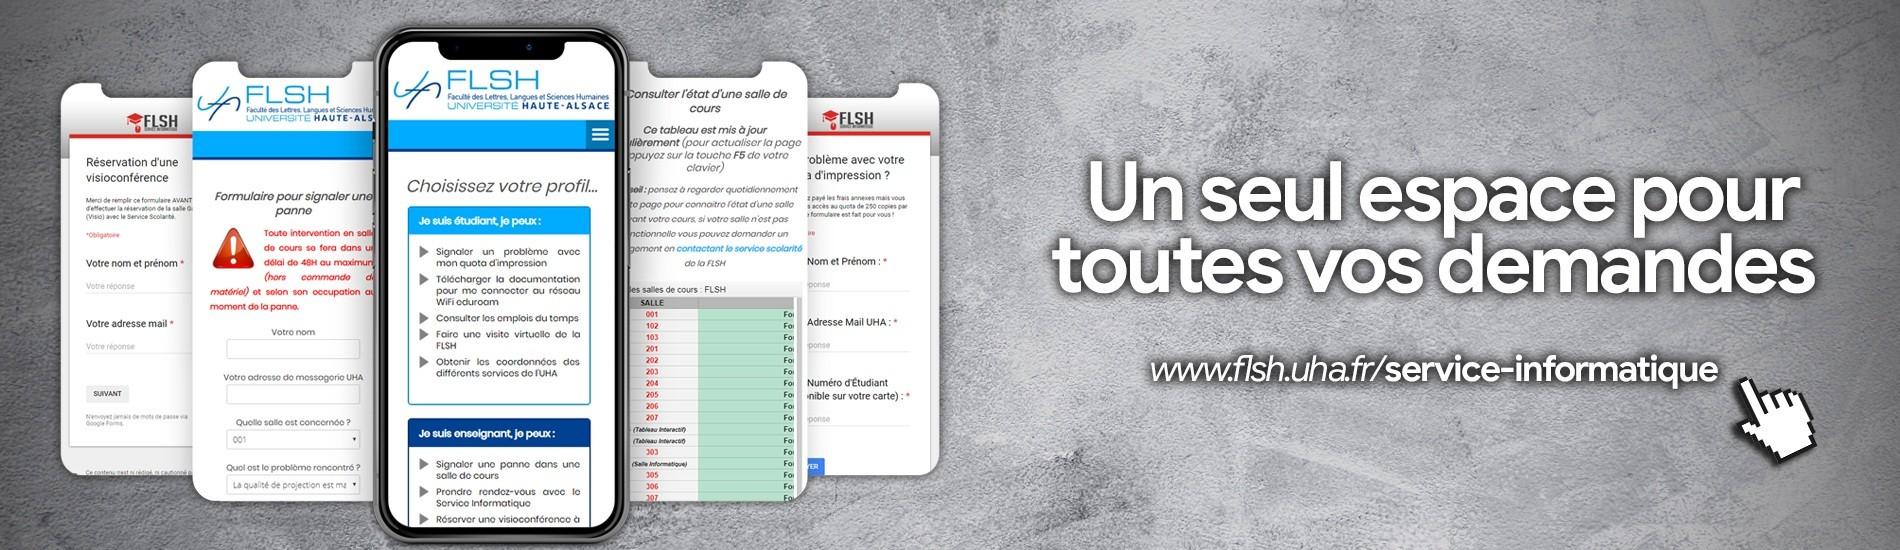 Service Informatique FLSH